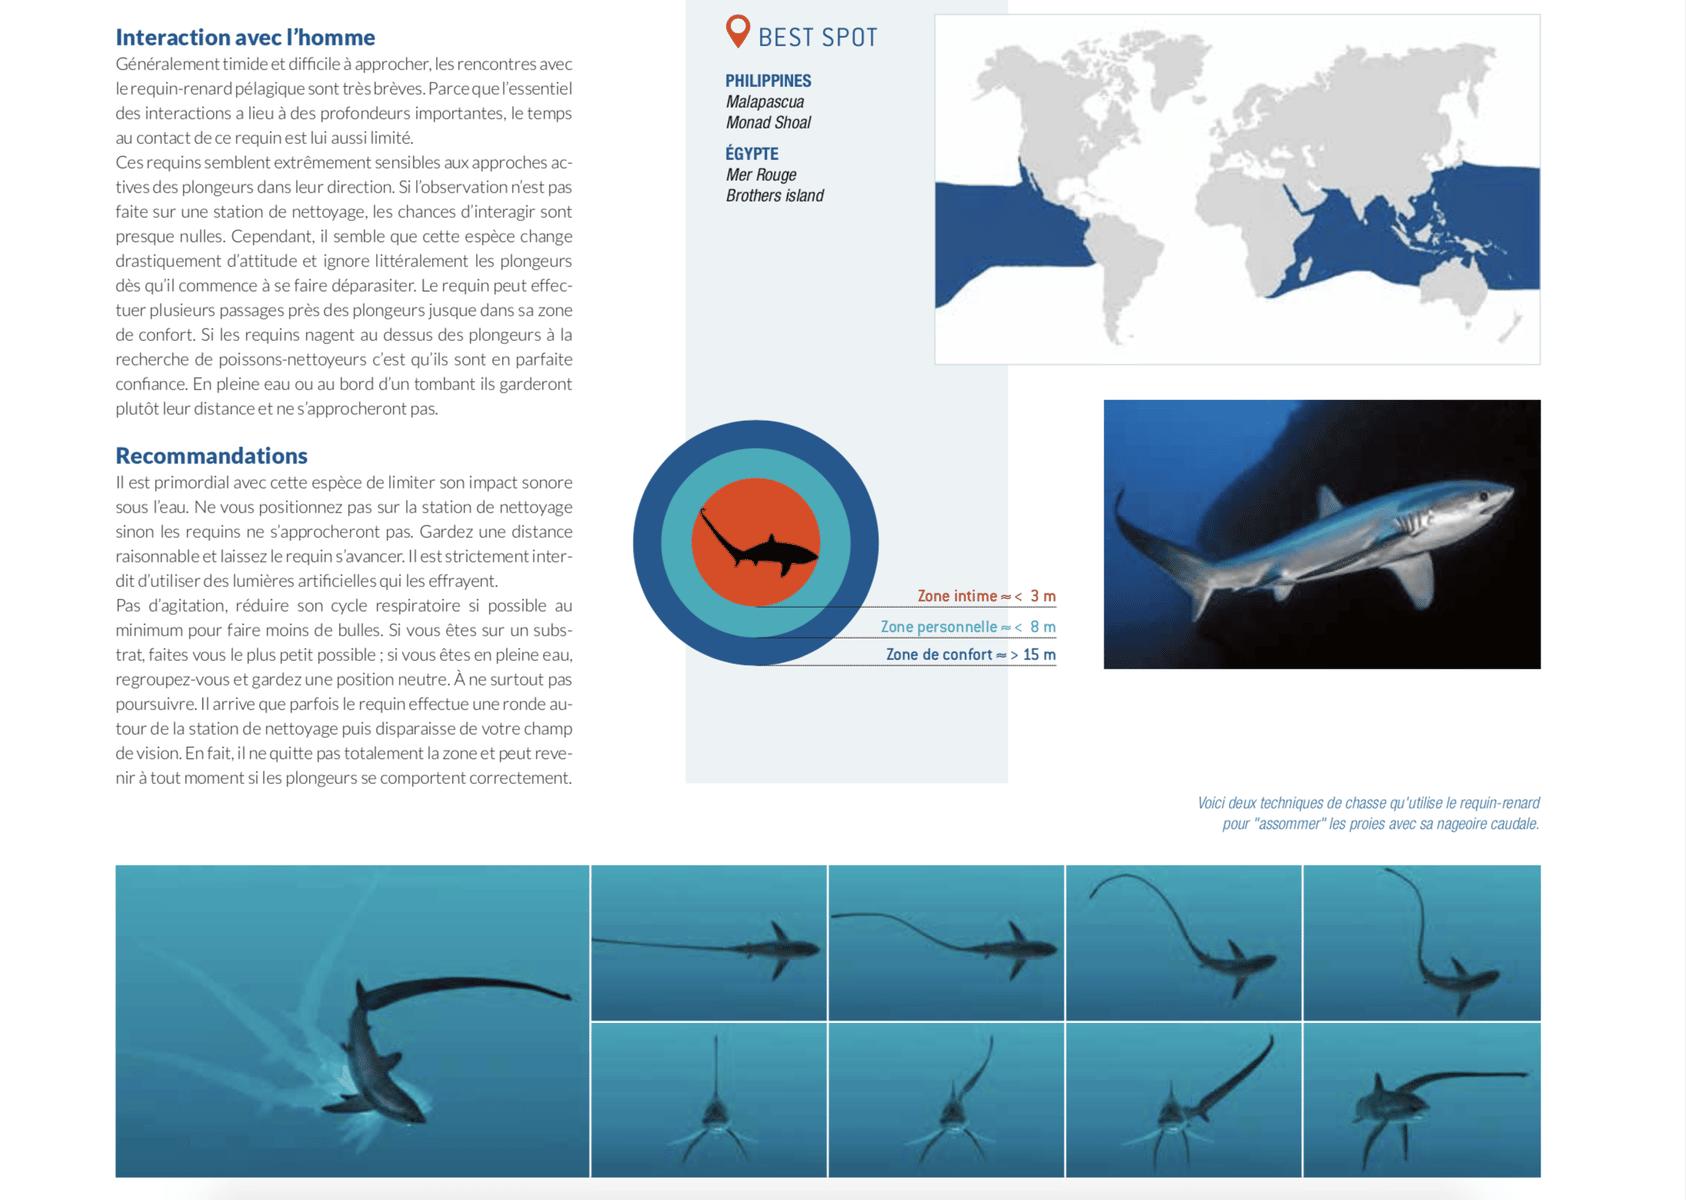 fiche requin renard best spot